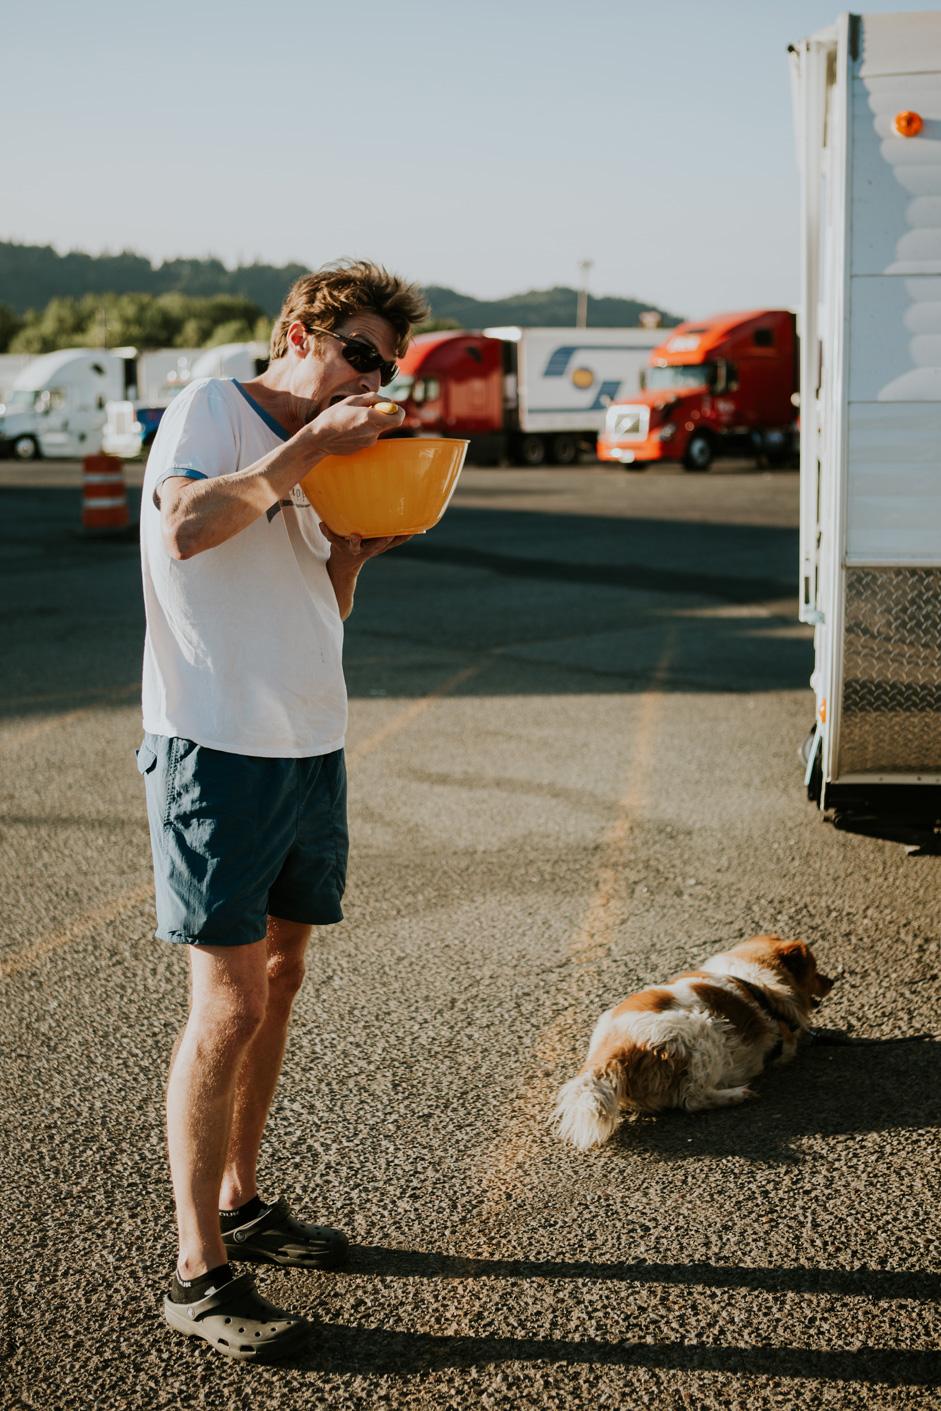 CindyGiovagnoli_BritishColumbia_Yukon_Alaska_roadtrip_AlCan_Alaskan_Highway_truck_camping-002.jpg